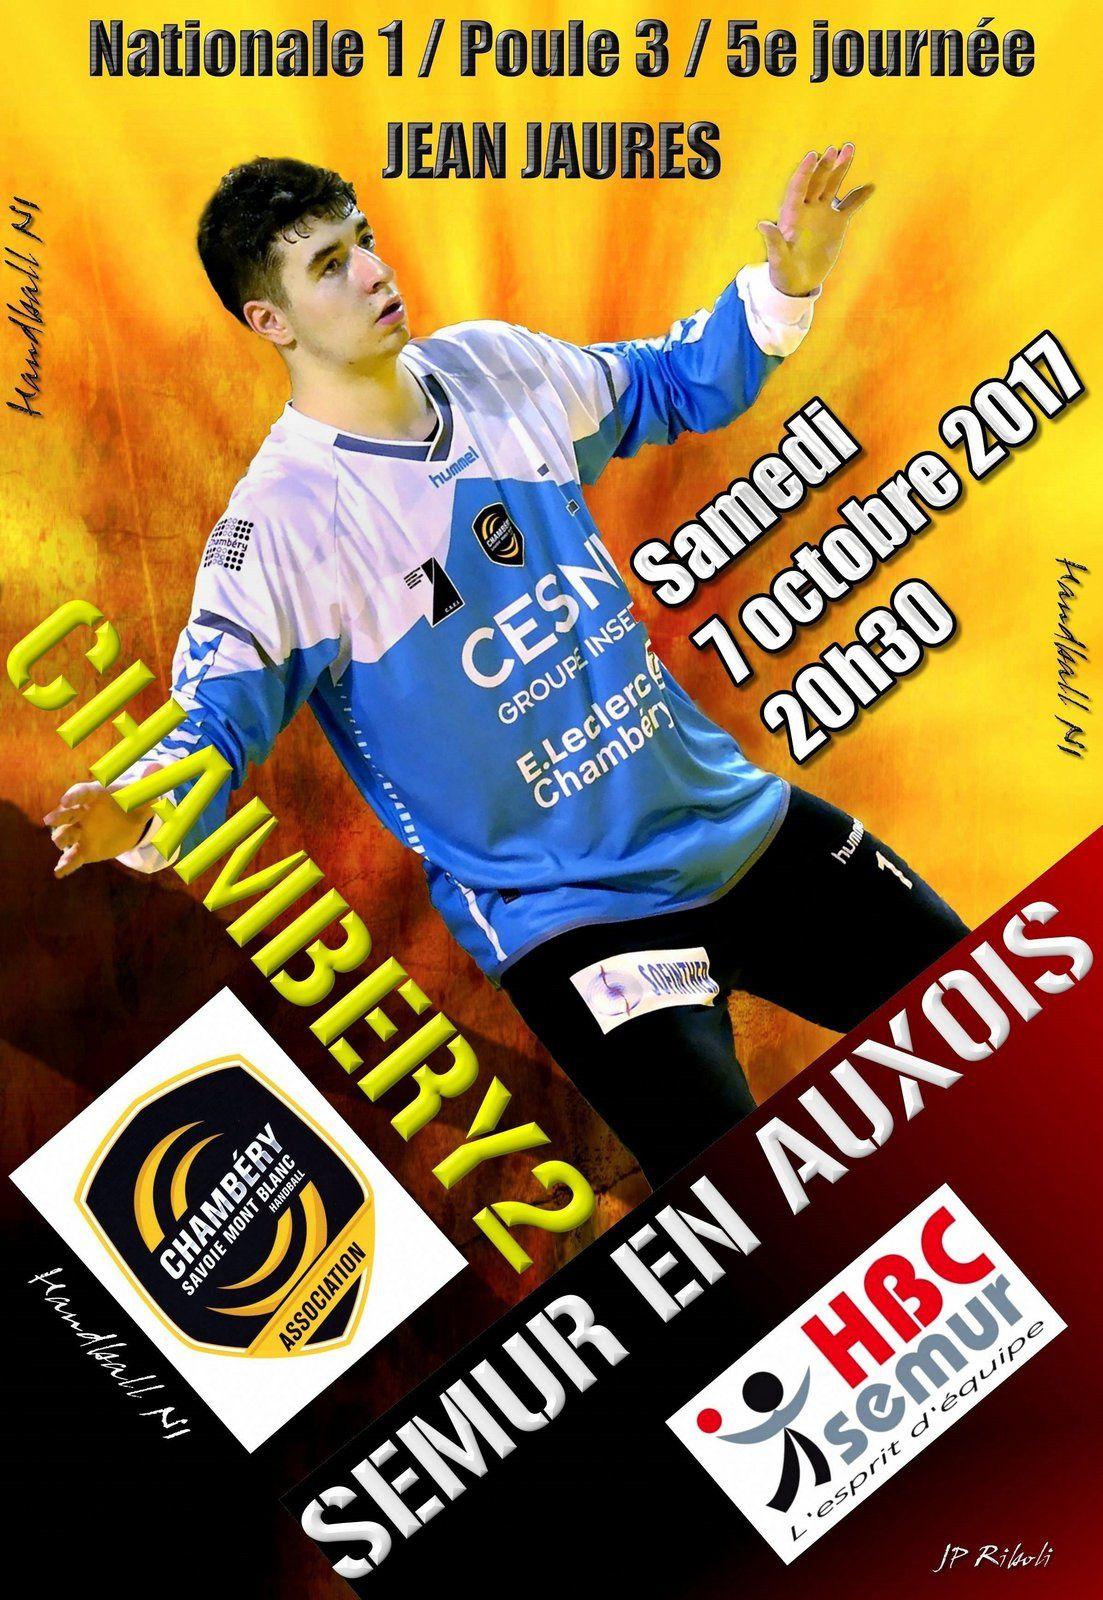 N1 Chambery2 Recoit Des Bourguignons Samedi 7 Octobre